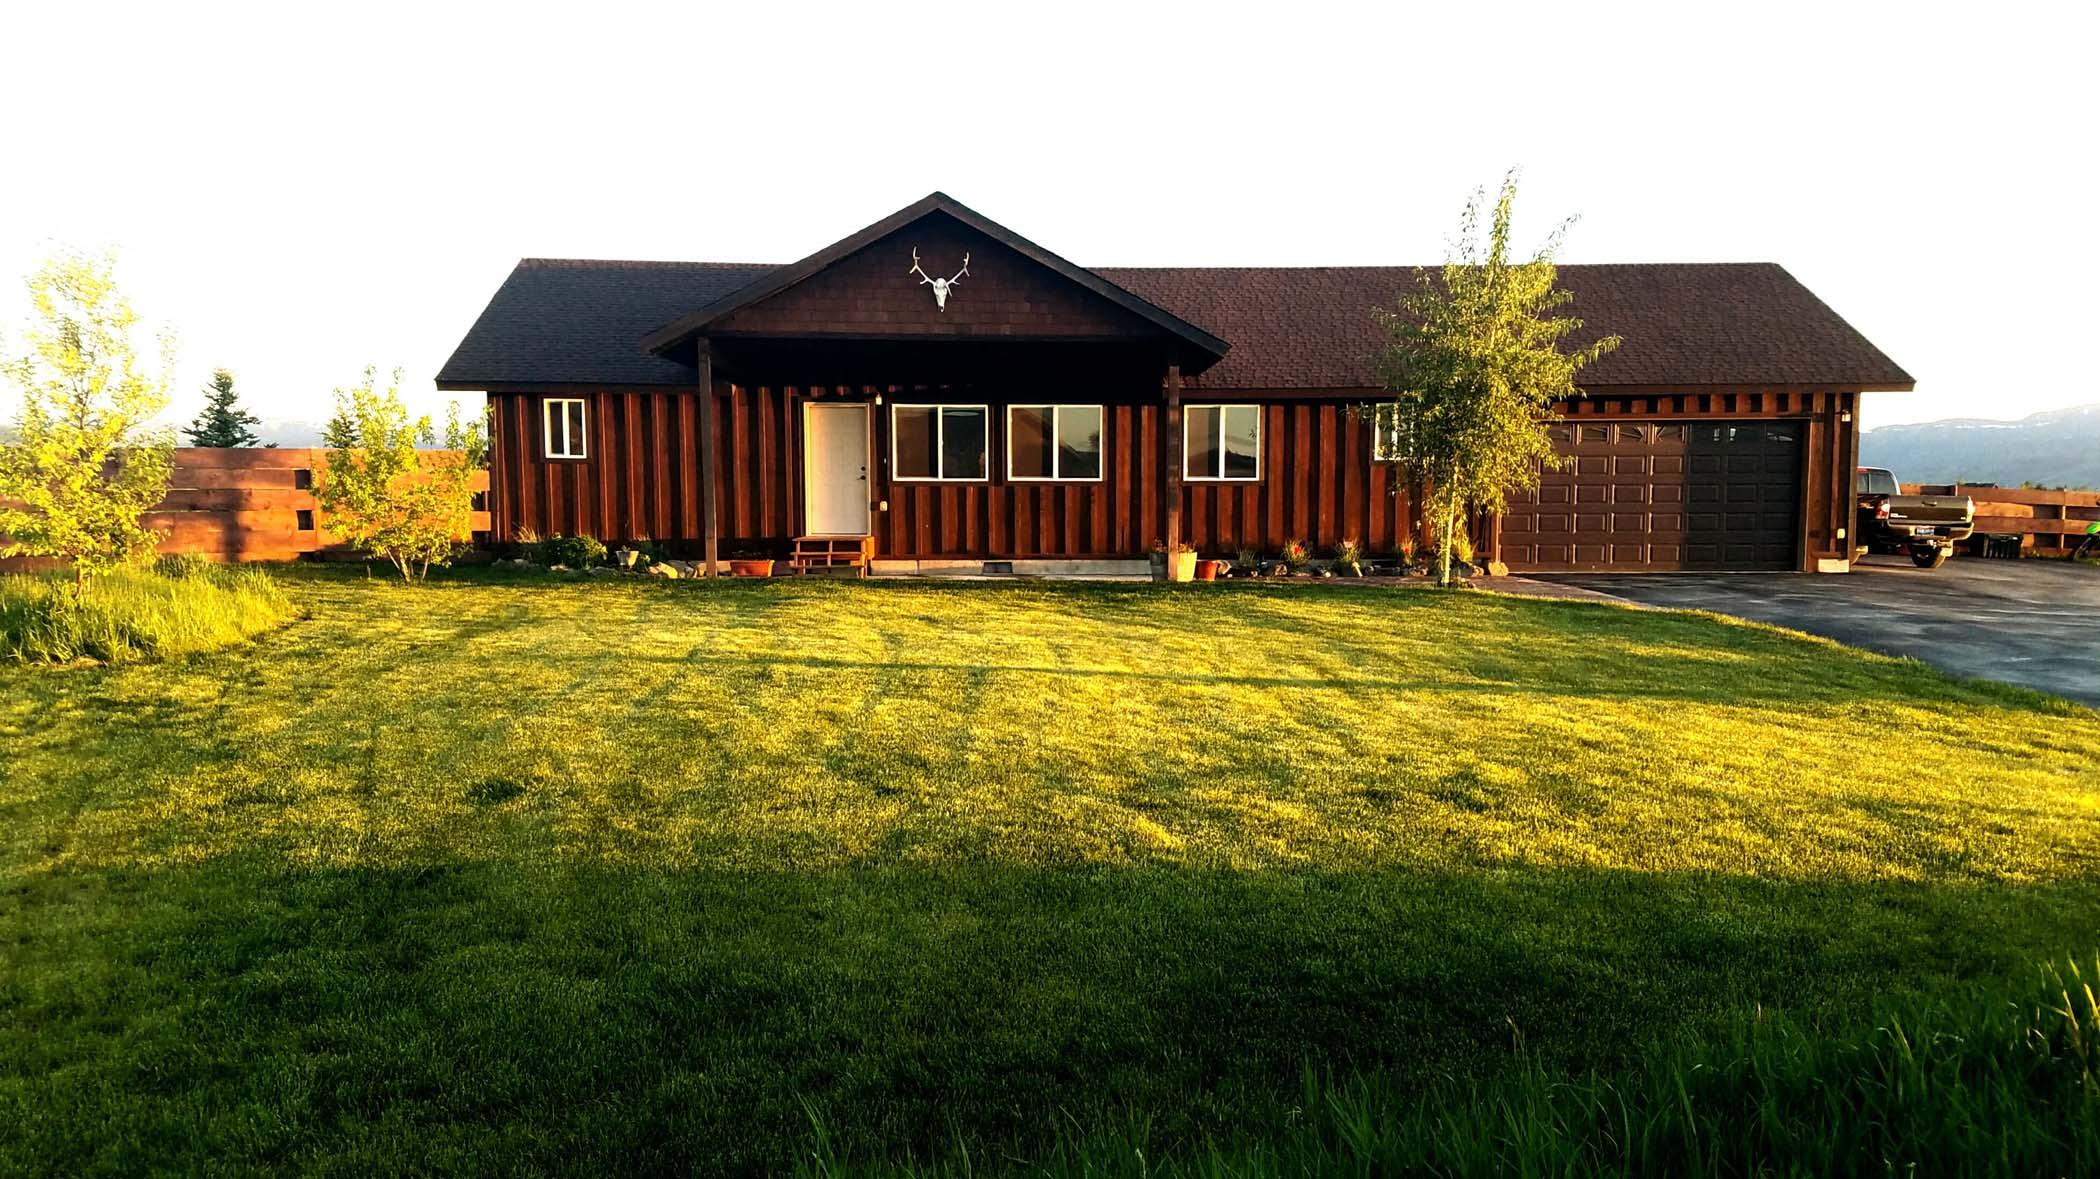 Single Family Home for Sale at Driggs Home - 1 Acre - No CCR's 759 Teague Avenue Driggs, Idaho, 83422 Jackson Hole, United States